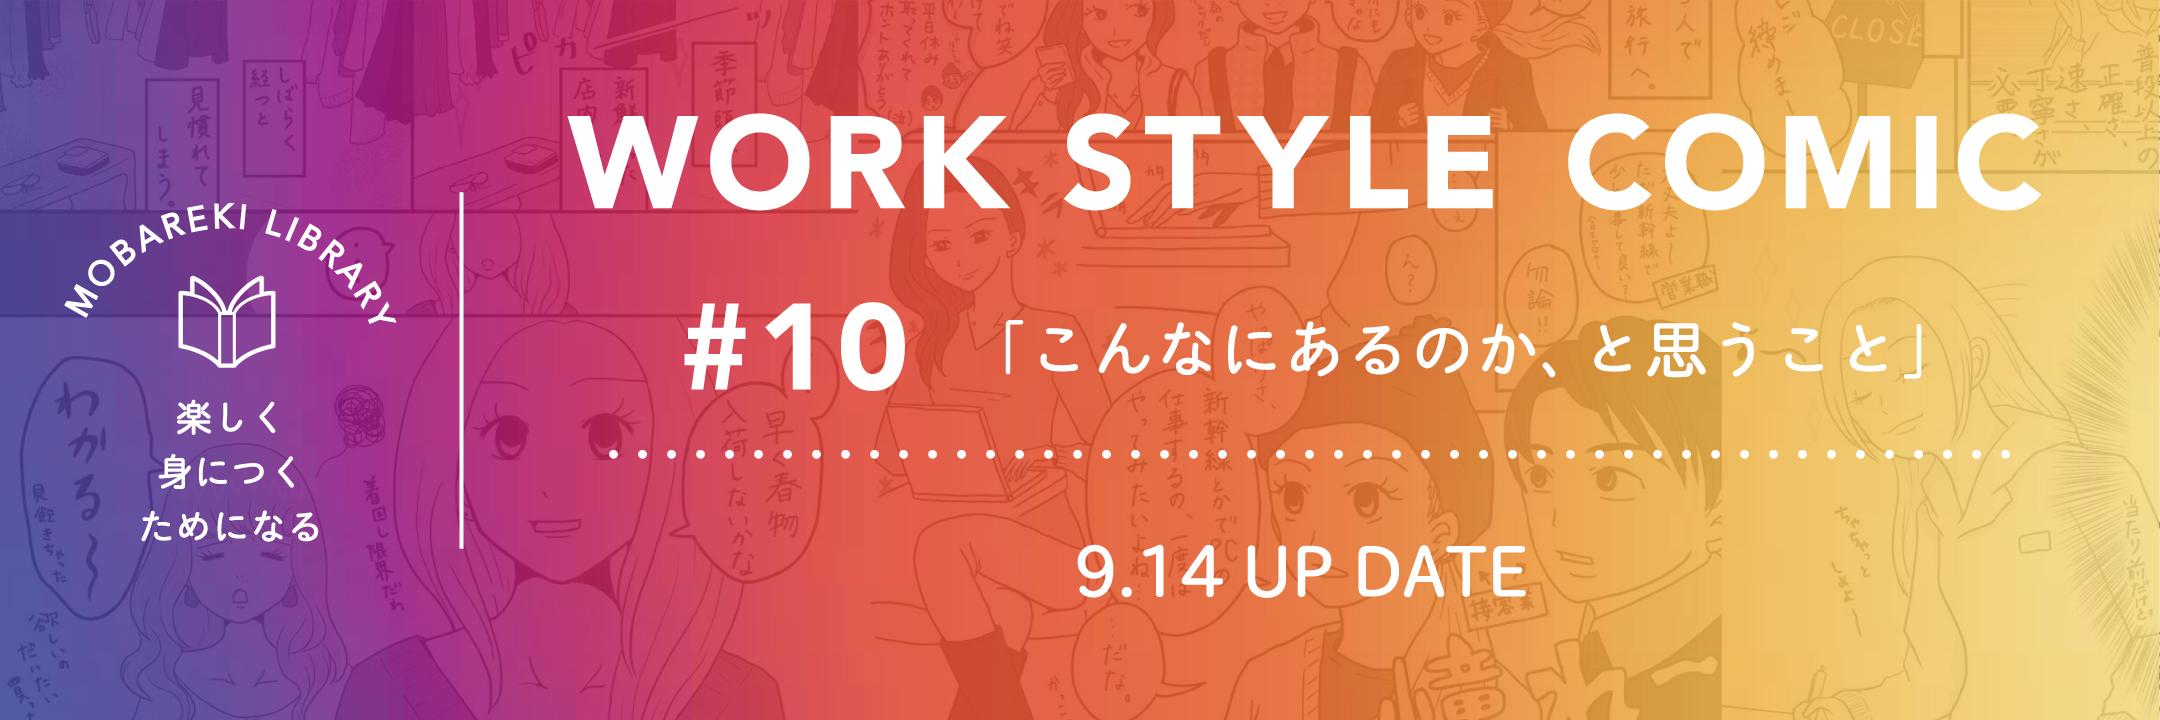 WORK STYLE COMIC #9